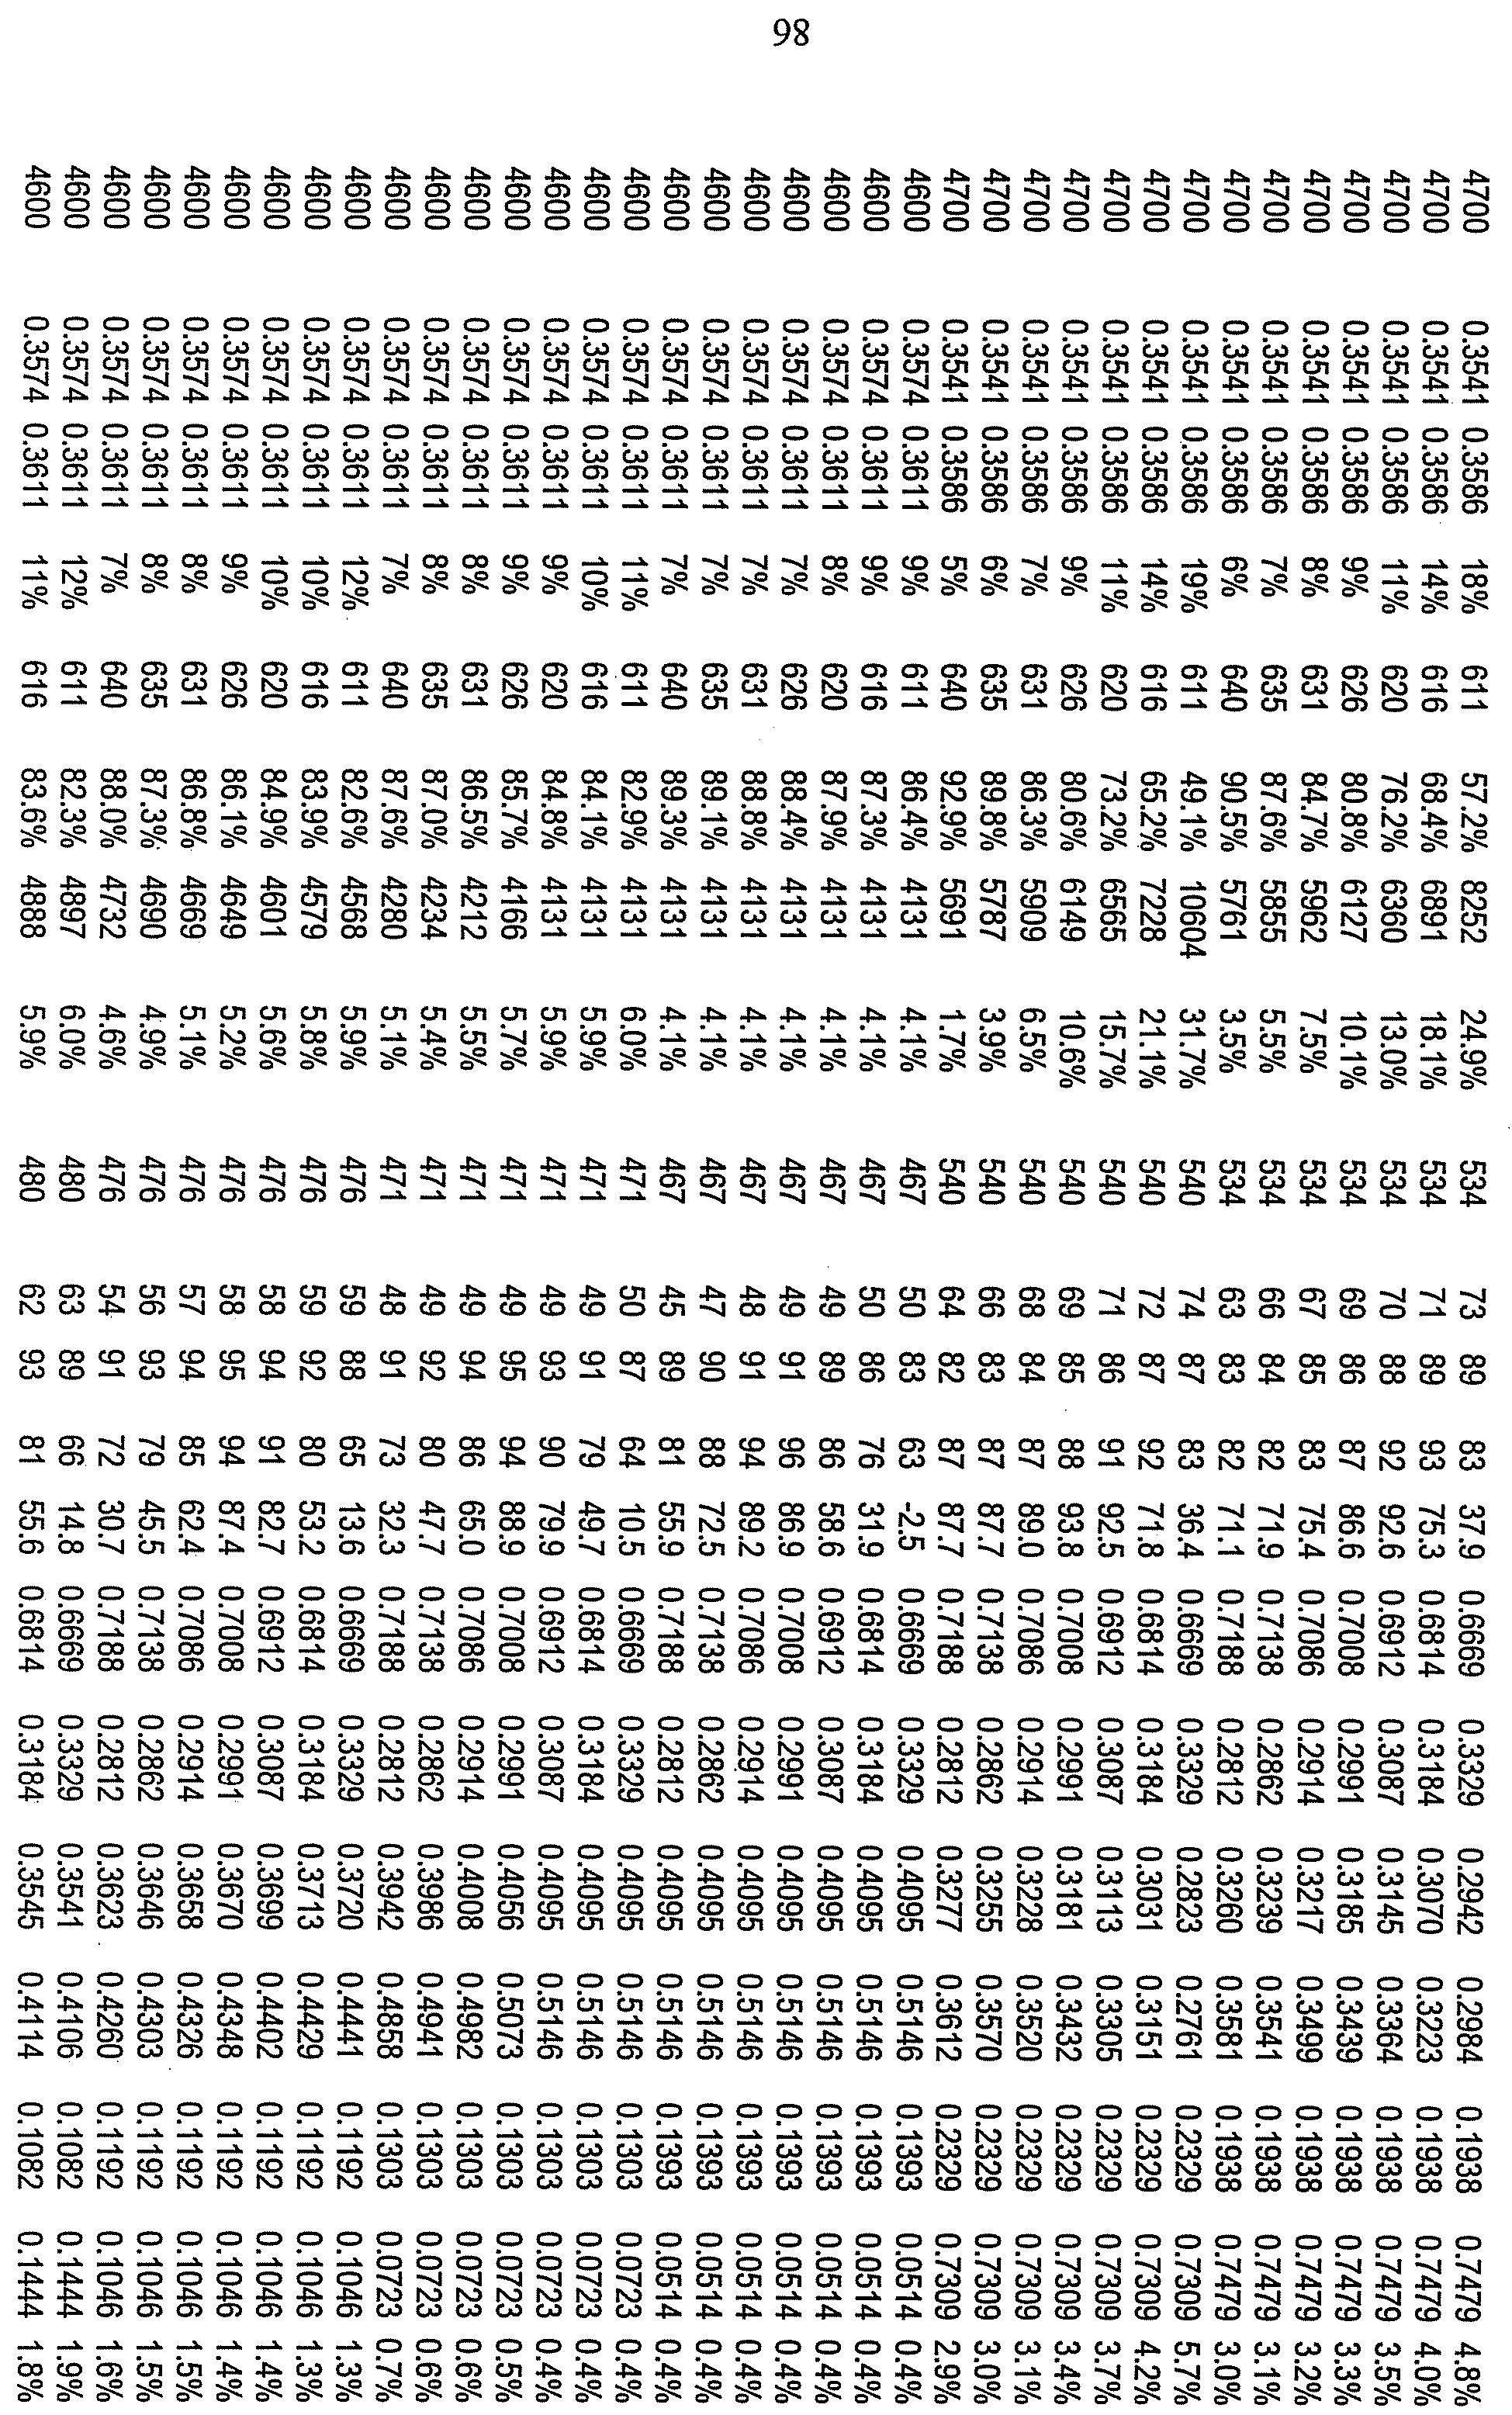 Figure 112010029469117-pct00052